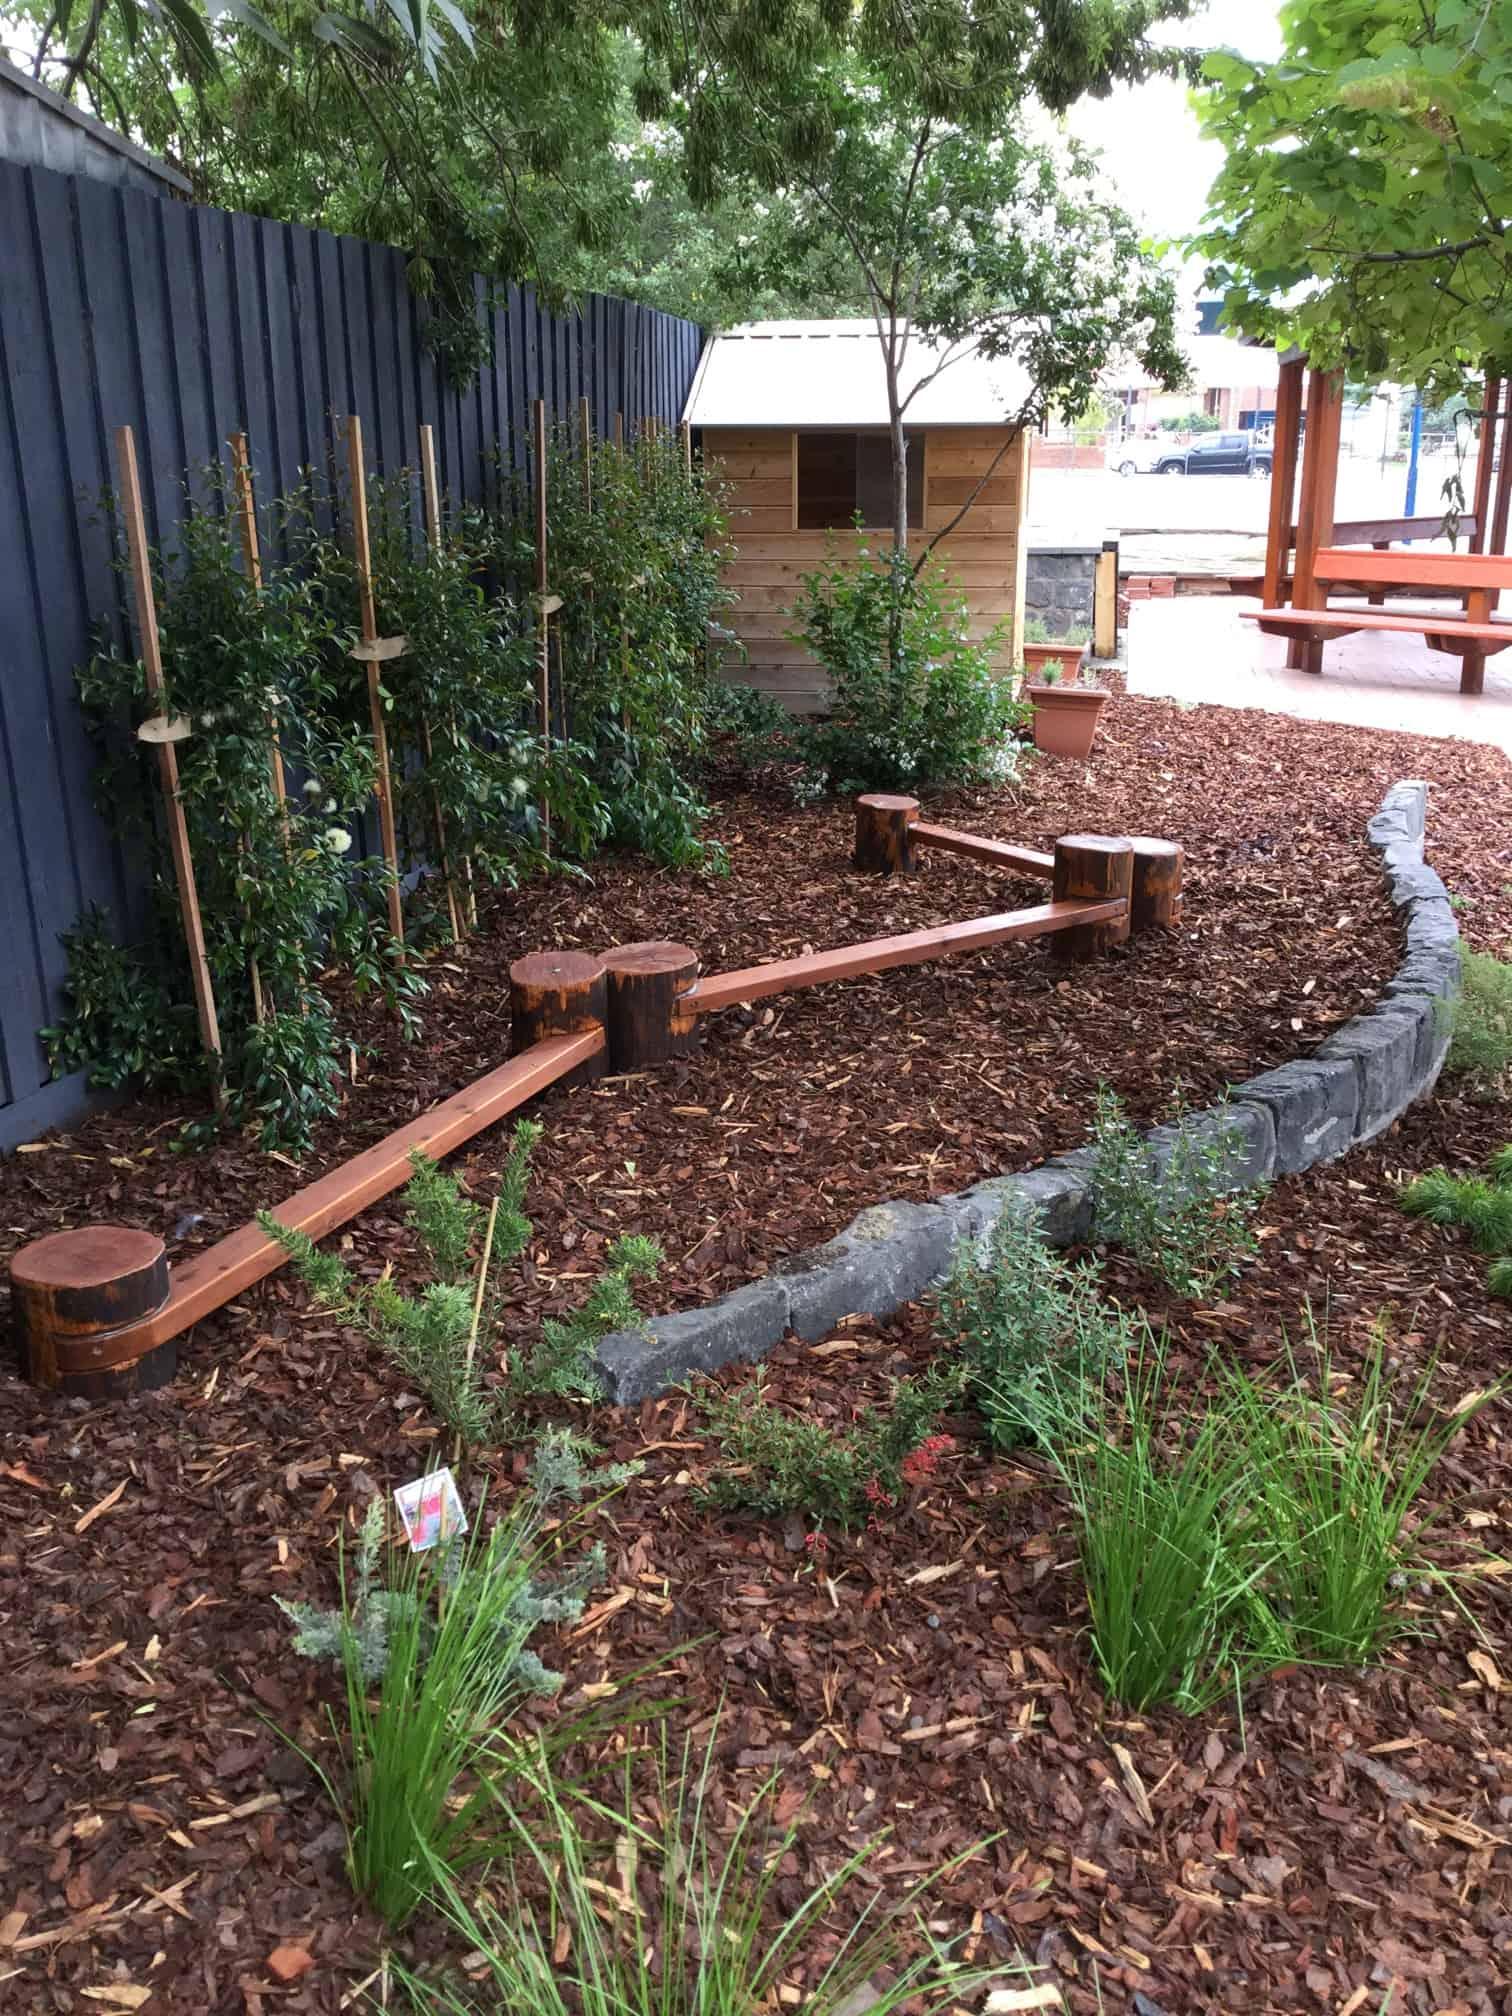 Primary School natural play area Victoria